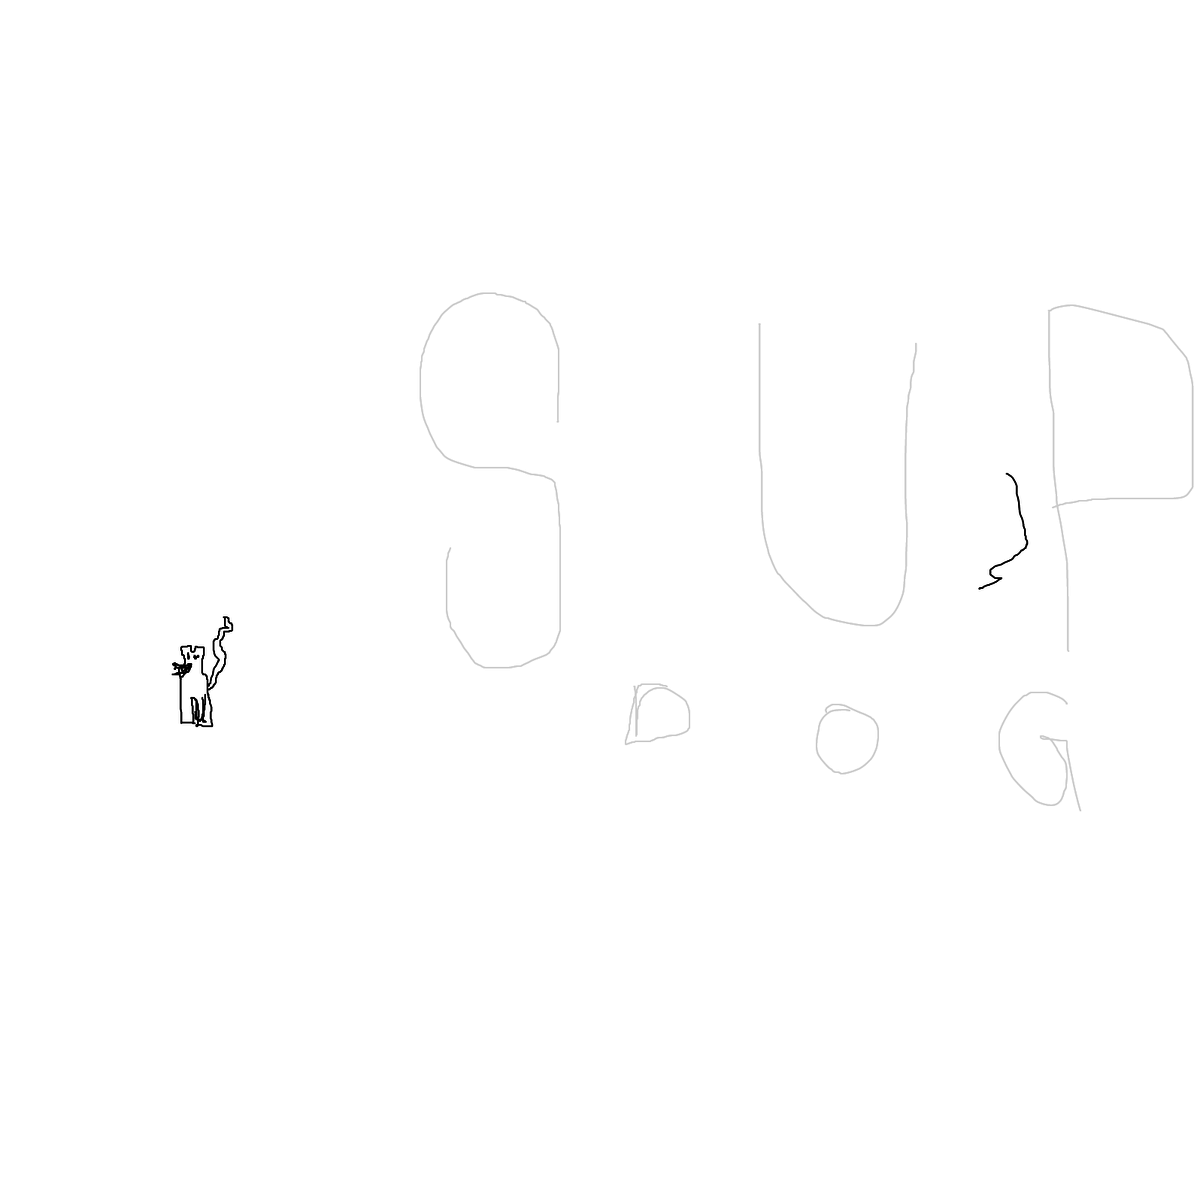 BAAAM drawing#7788 lat:42.3747863769531250lng: 20.4319648742675780